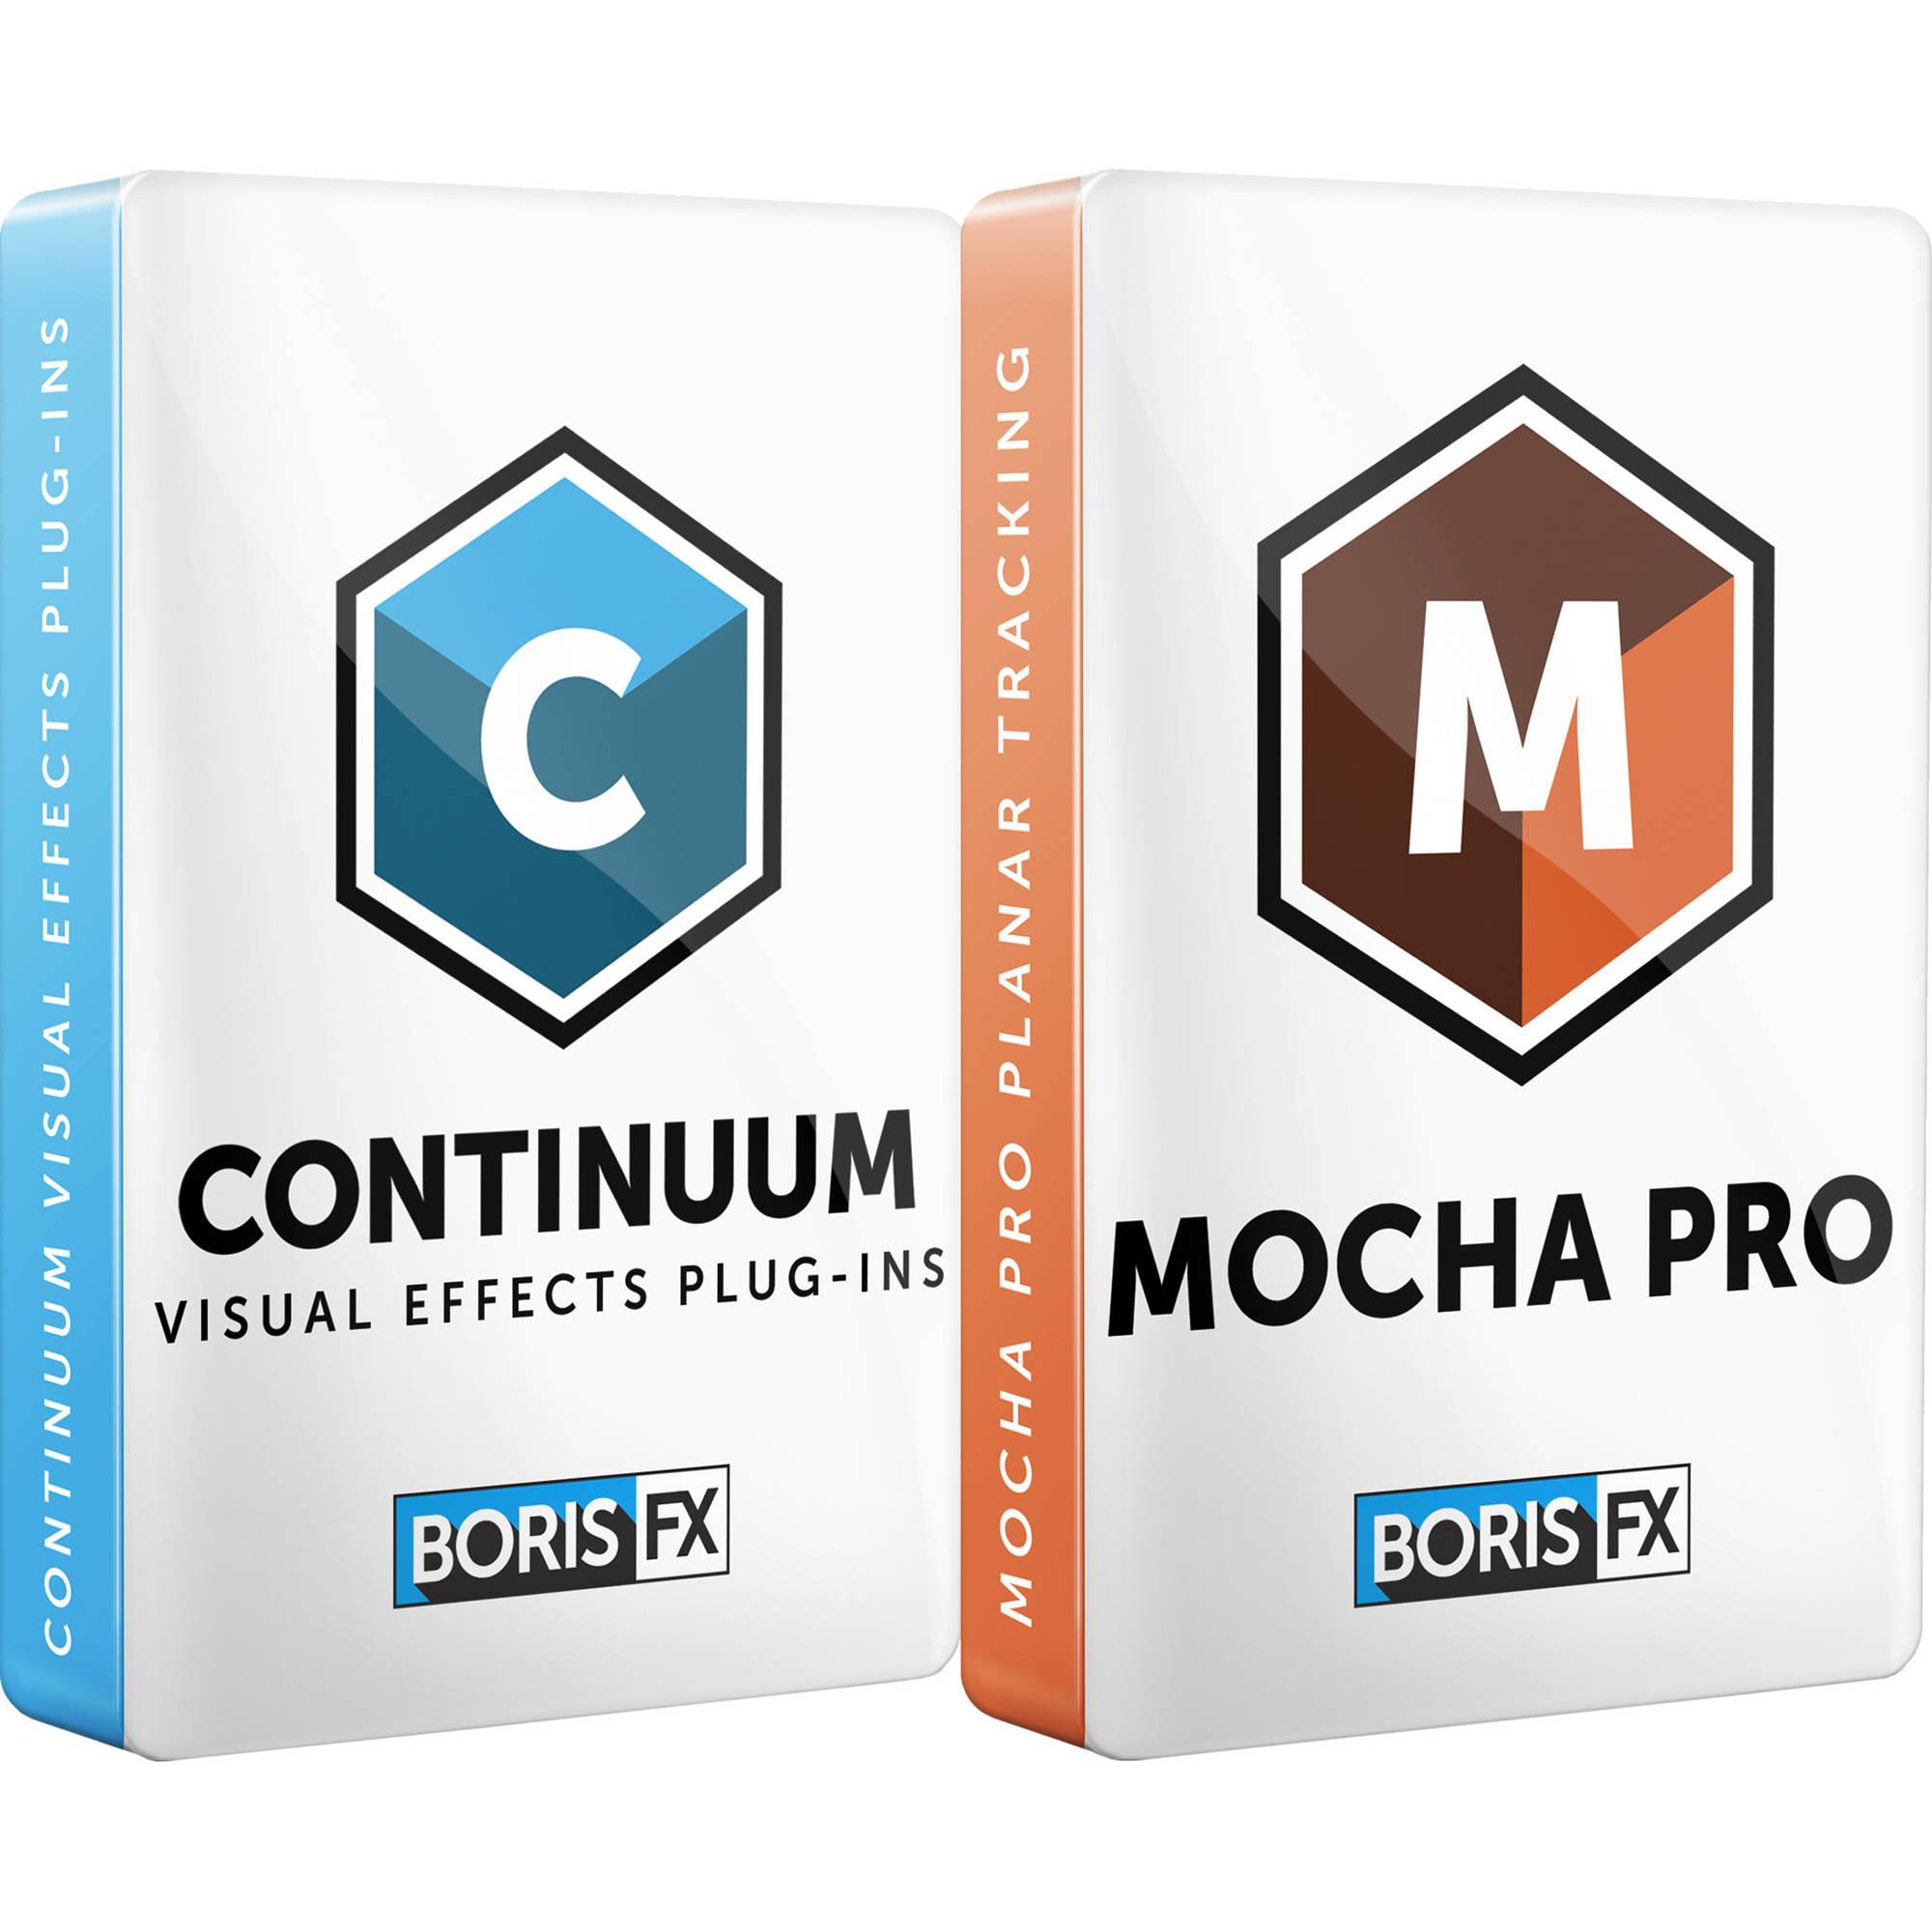 Boris FX Continuum + Mocha Pro 2019 for Adobe/OFX Bundle (Annual  Subscription, Download)